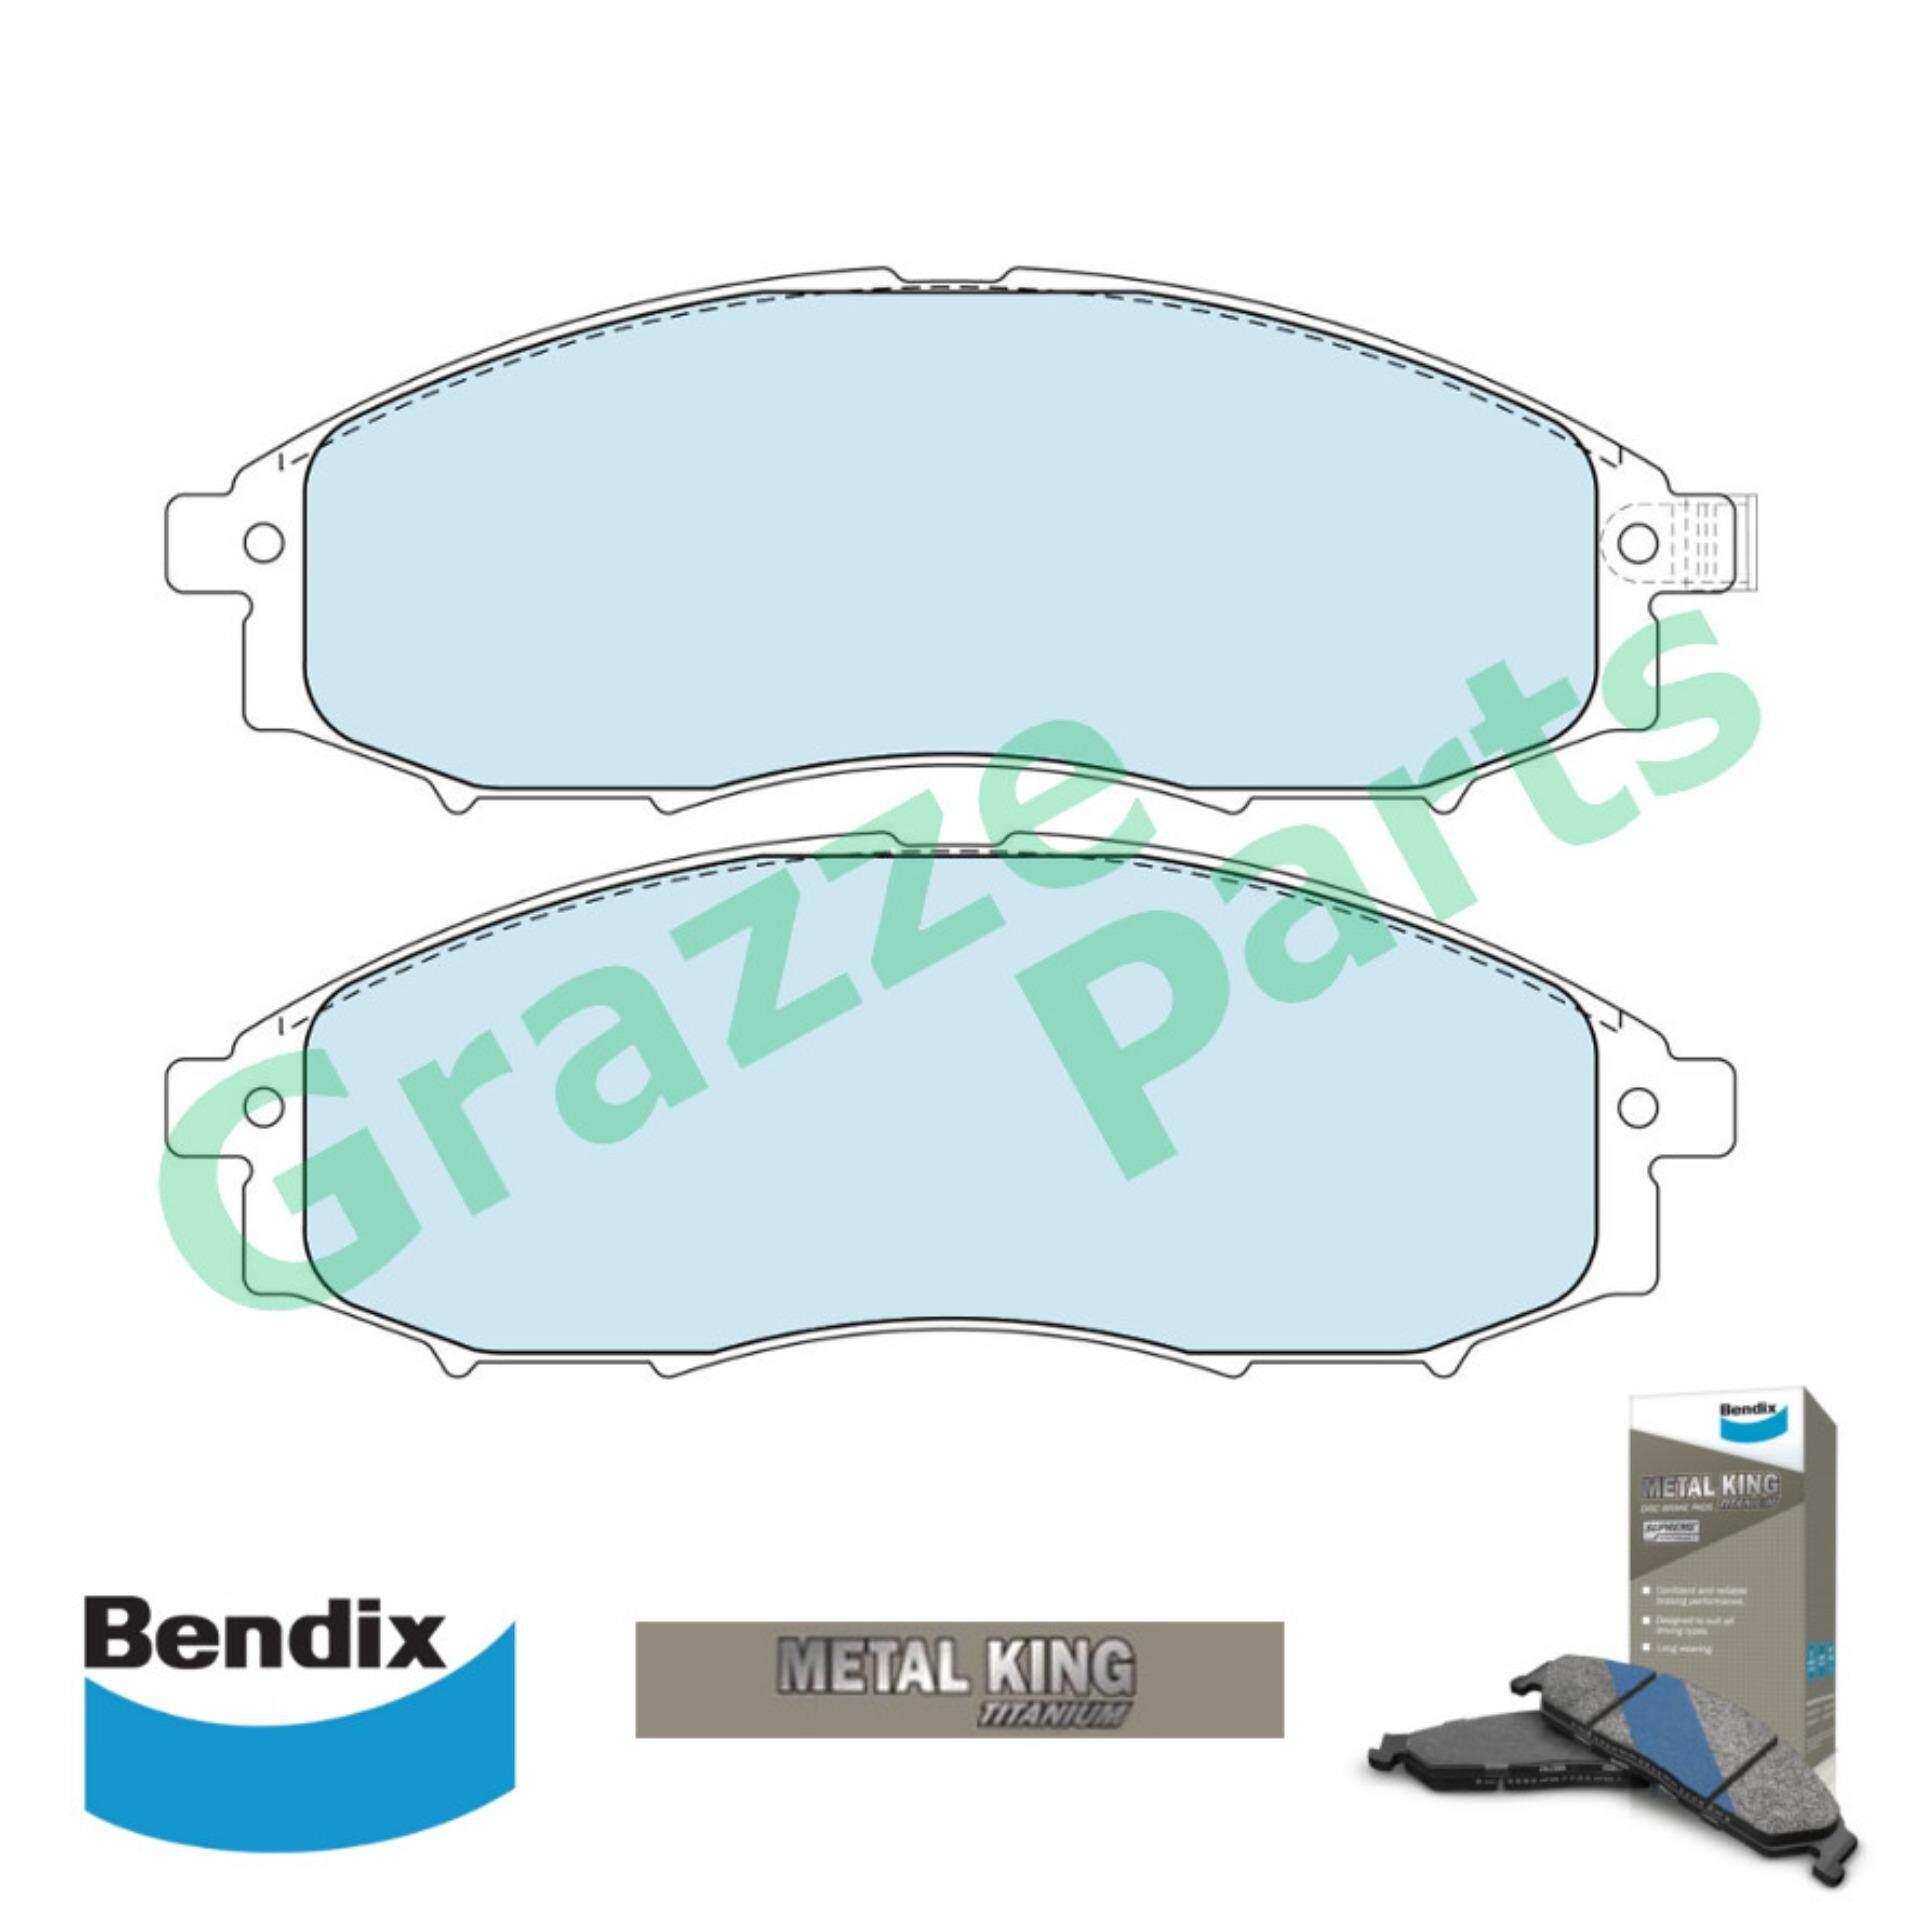 Bendix Metal King Titanium Disc Brake Pad Front for DB1439 - Nissan Frontier D22